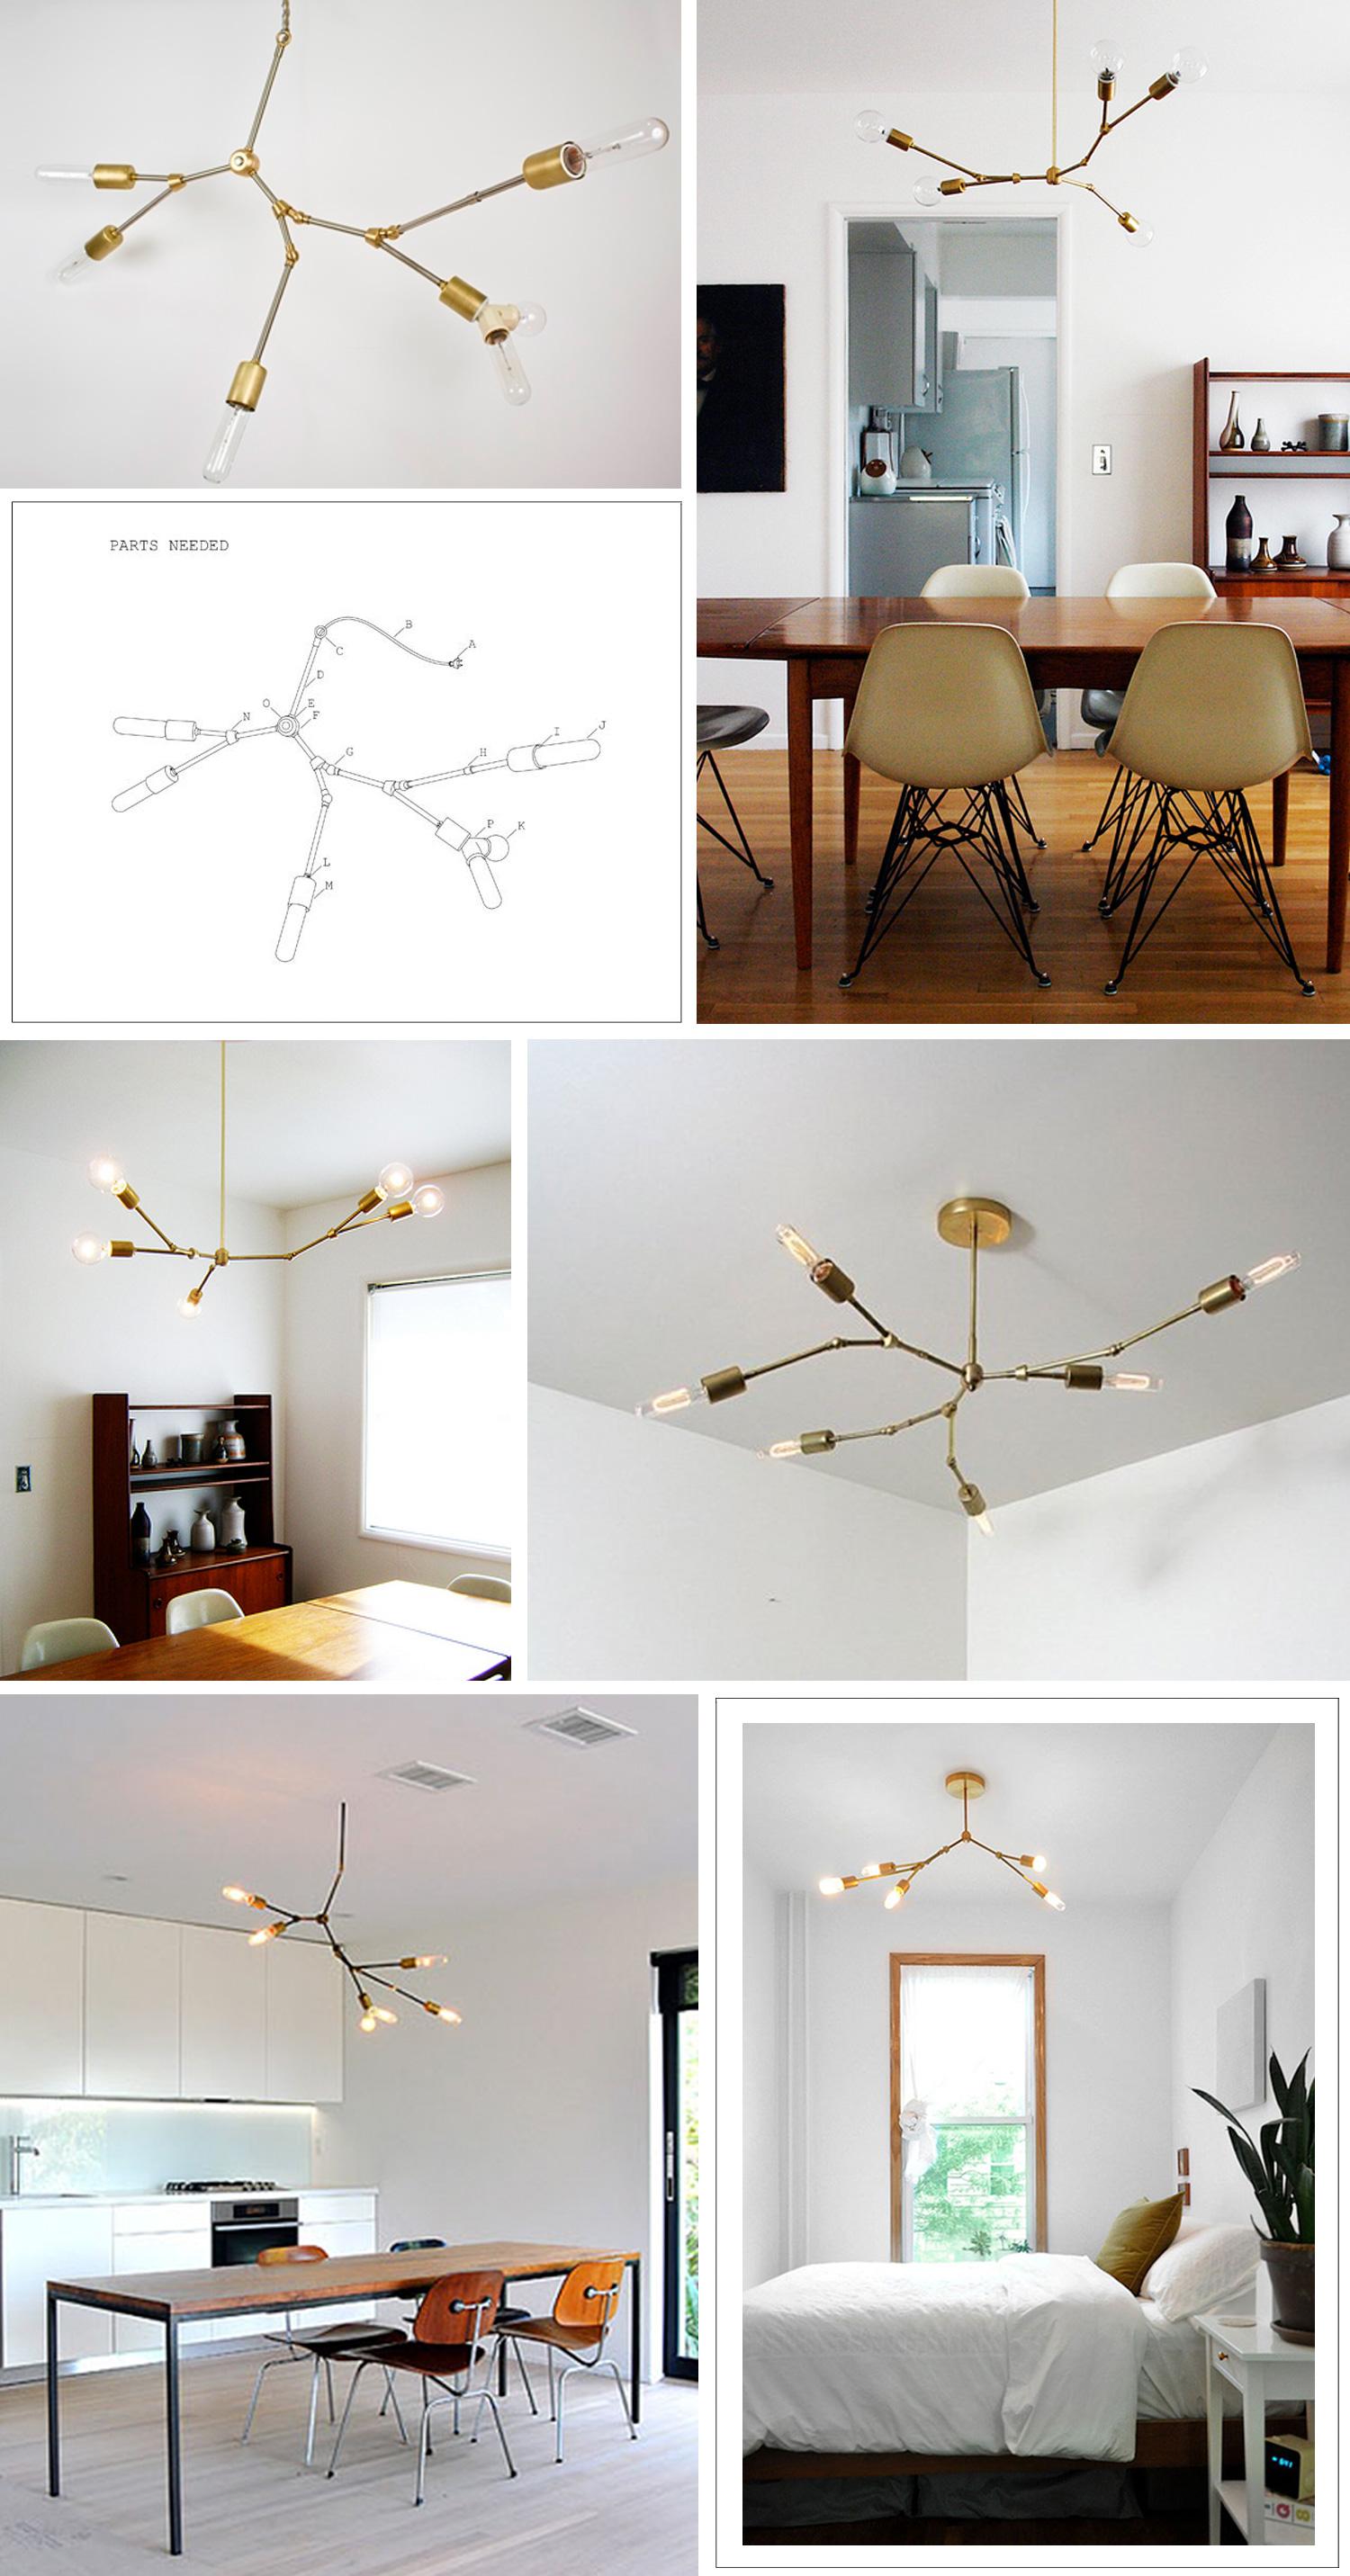 diy-lampe-lindsey-adelman